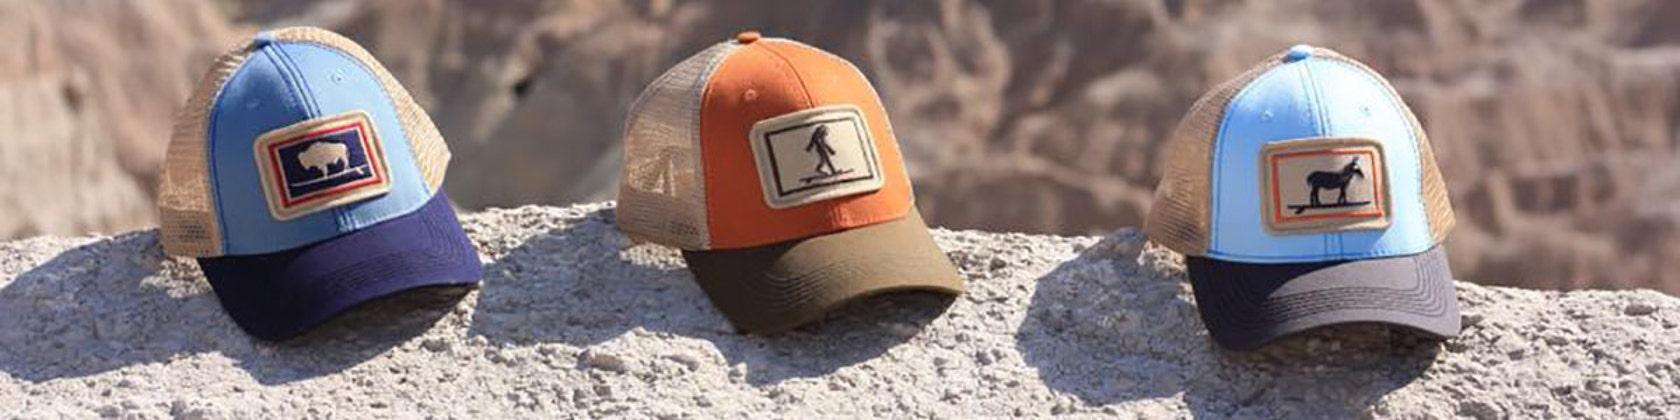 SLADDD1 Canada Warm Winter Hat Knit Beanie Skull Cap Cuff Beanie Hat Winter Hats for Men /& Women